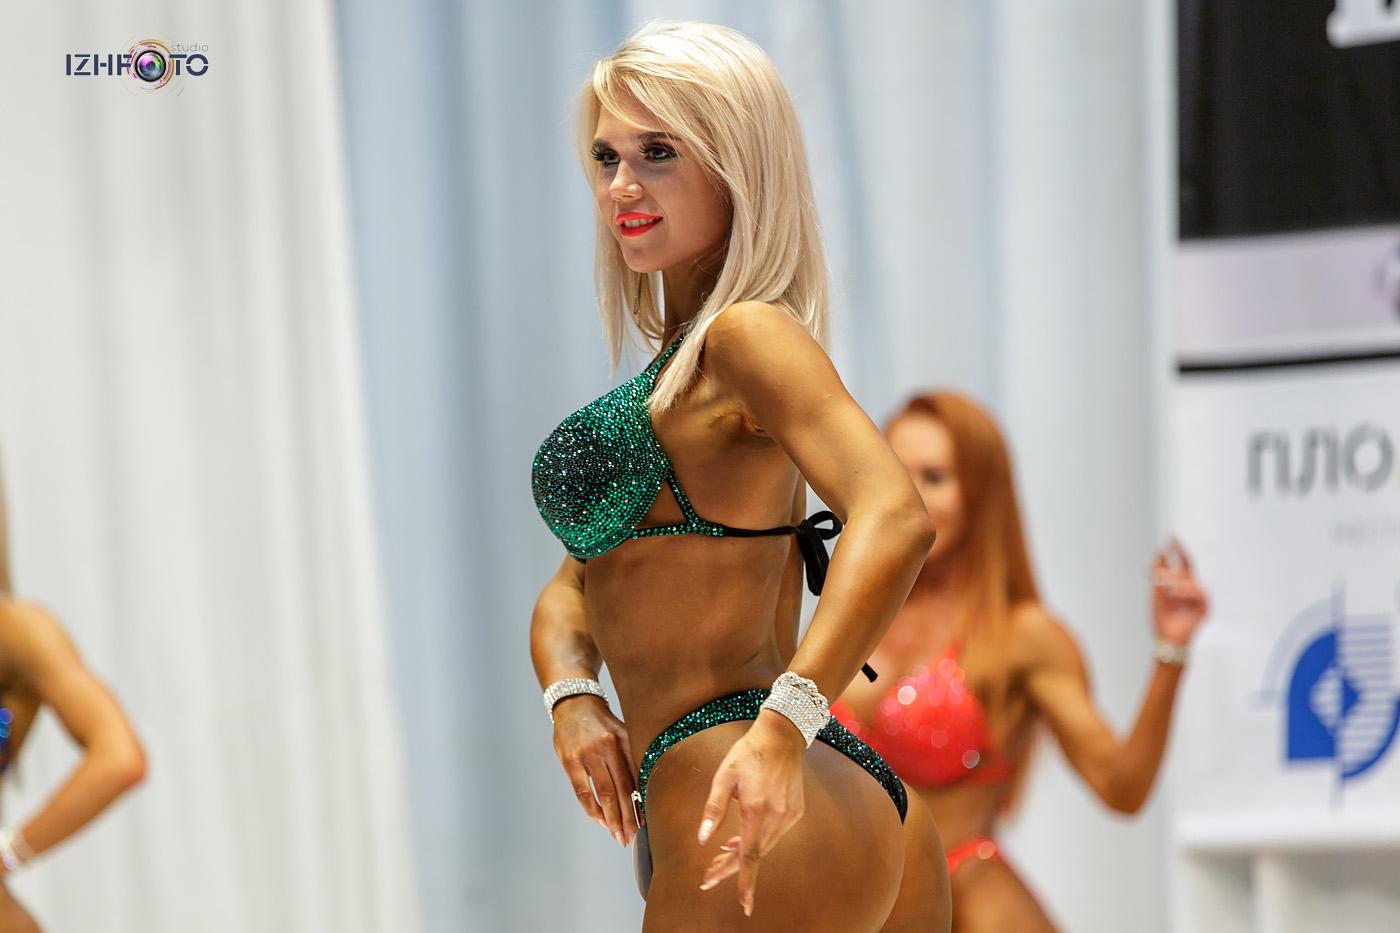 Категория свыше 166 см Fitness Bikini